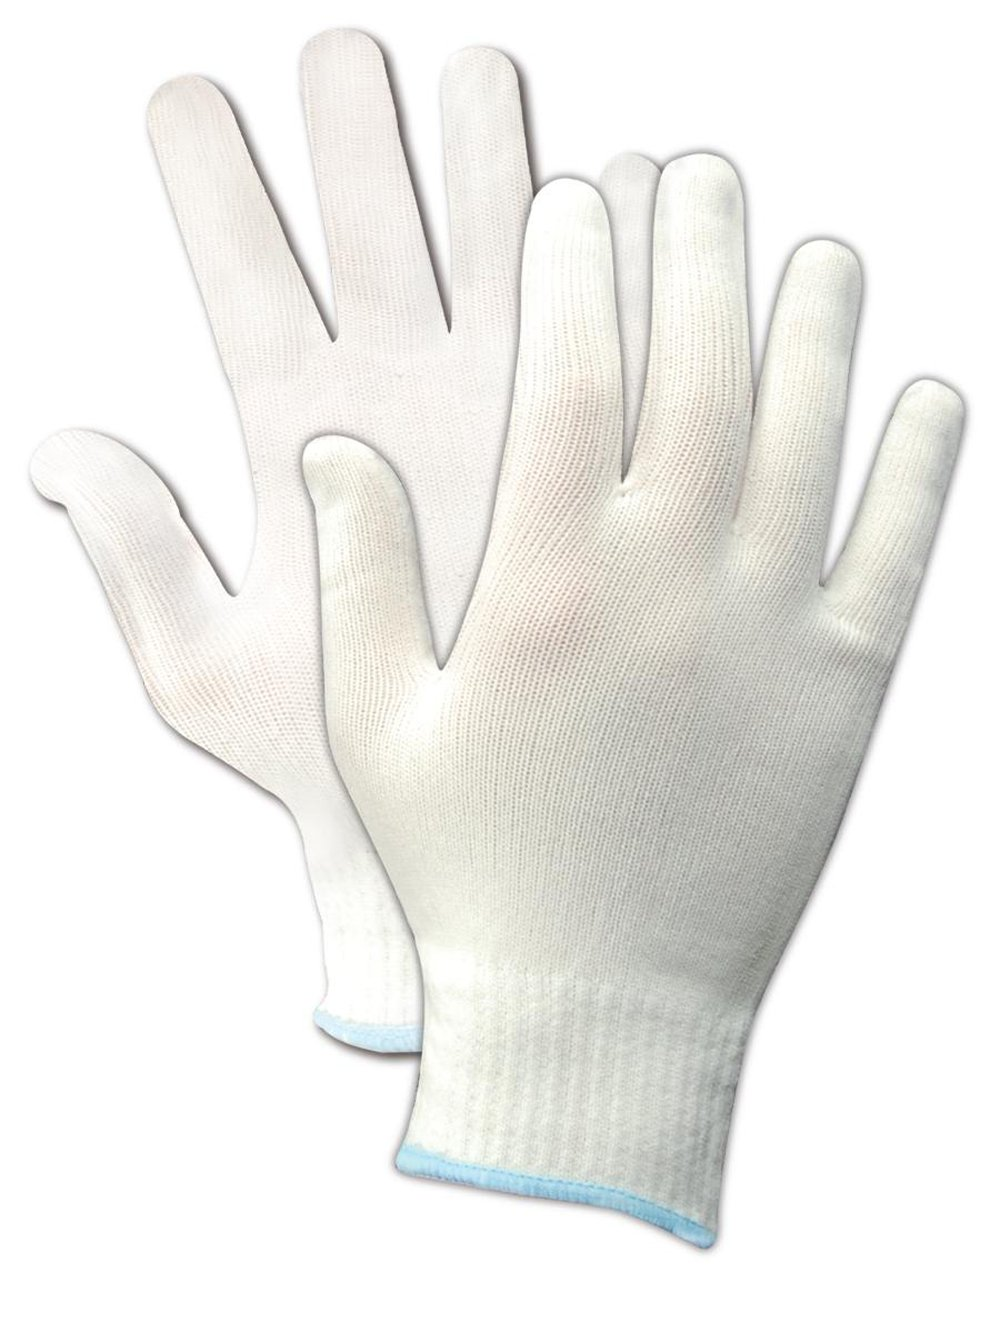 "Magid FiberLock Precision I 31NY 9¼"" Medium Weight Machine Knit Nylon Gloves, Large"